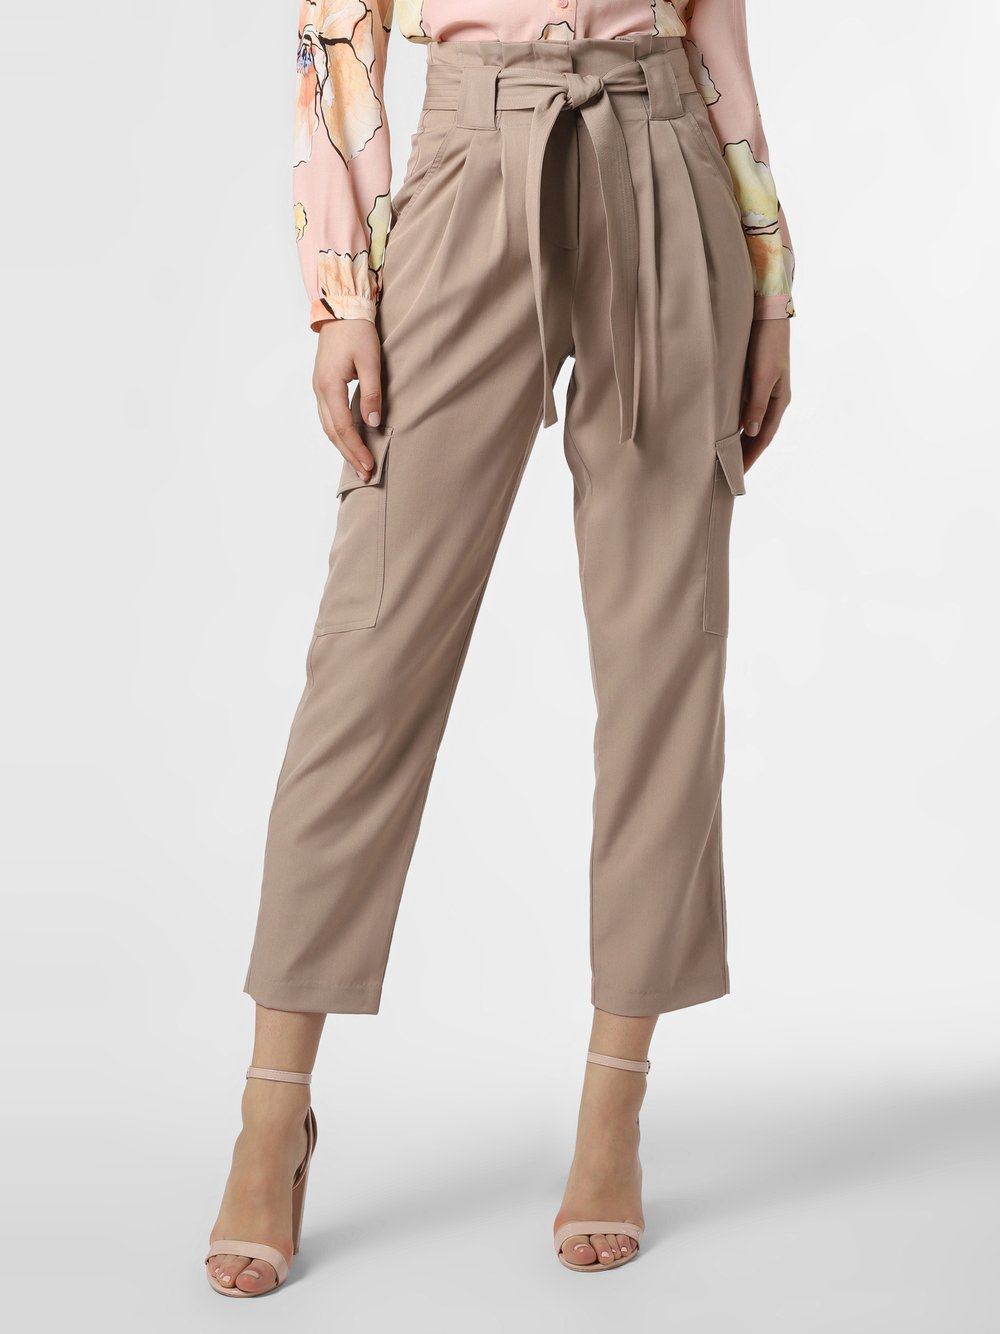 Y.A.S – Spodnie damskie – Yascairo, beżowy Van Graaf 469158-0001-09920